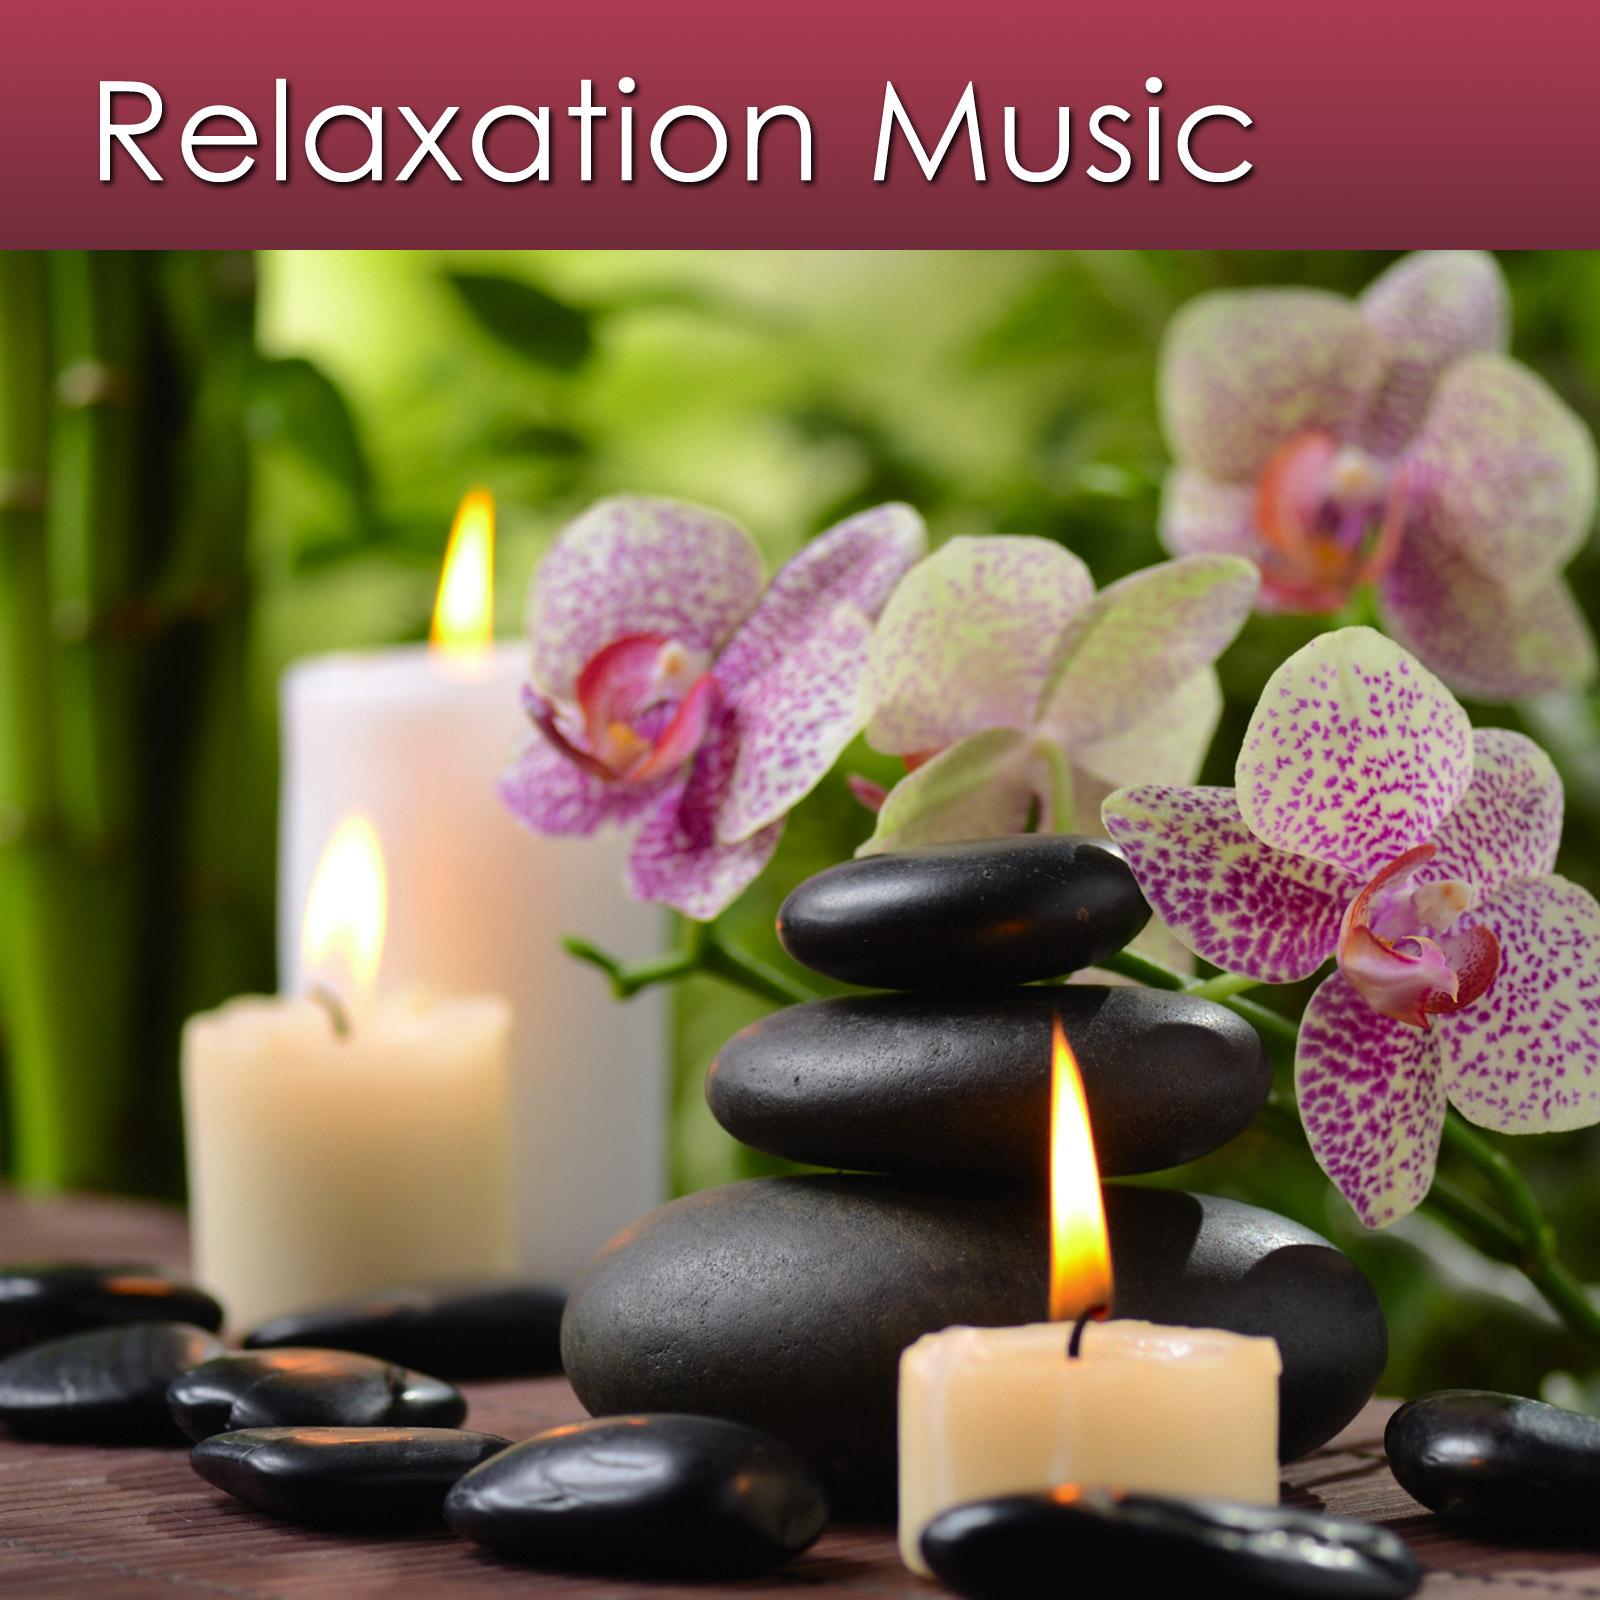 Relaxation-Music1600x1600-1.jpg